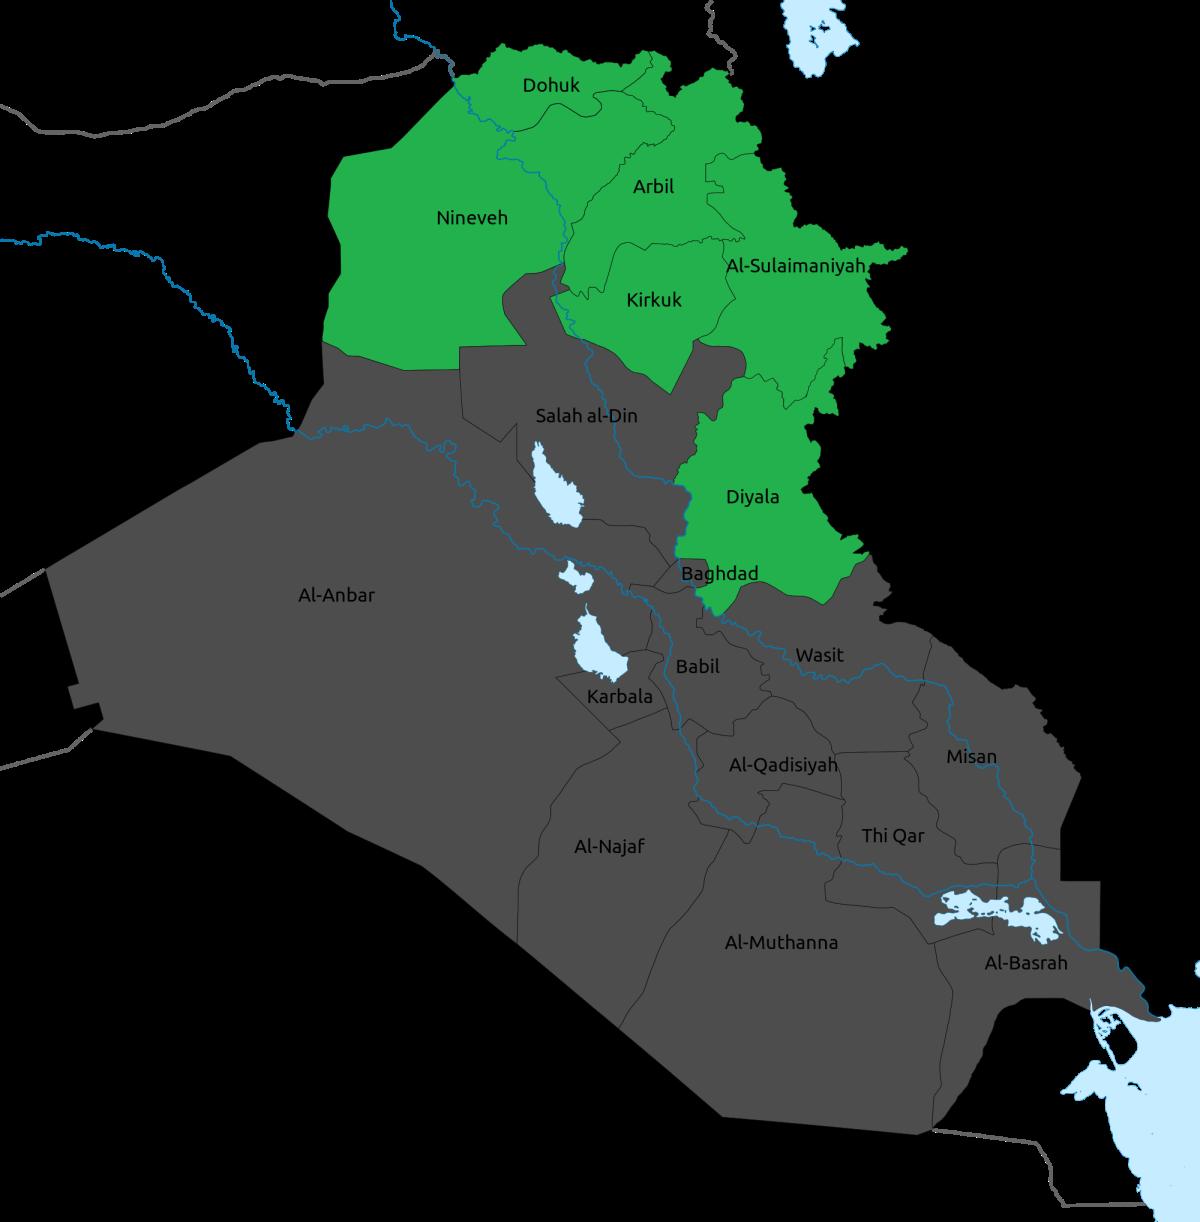 مسألهٔ استقلالِ کردستان: راه وبیراههها